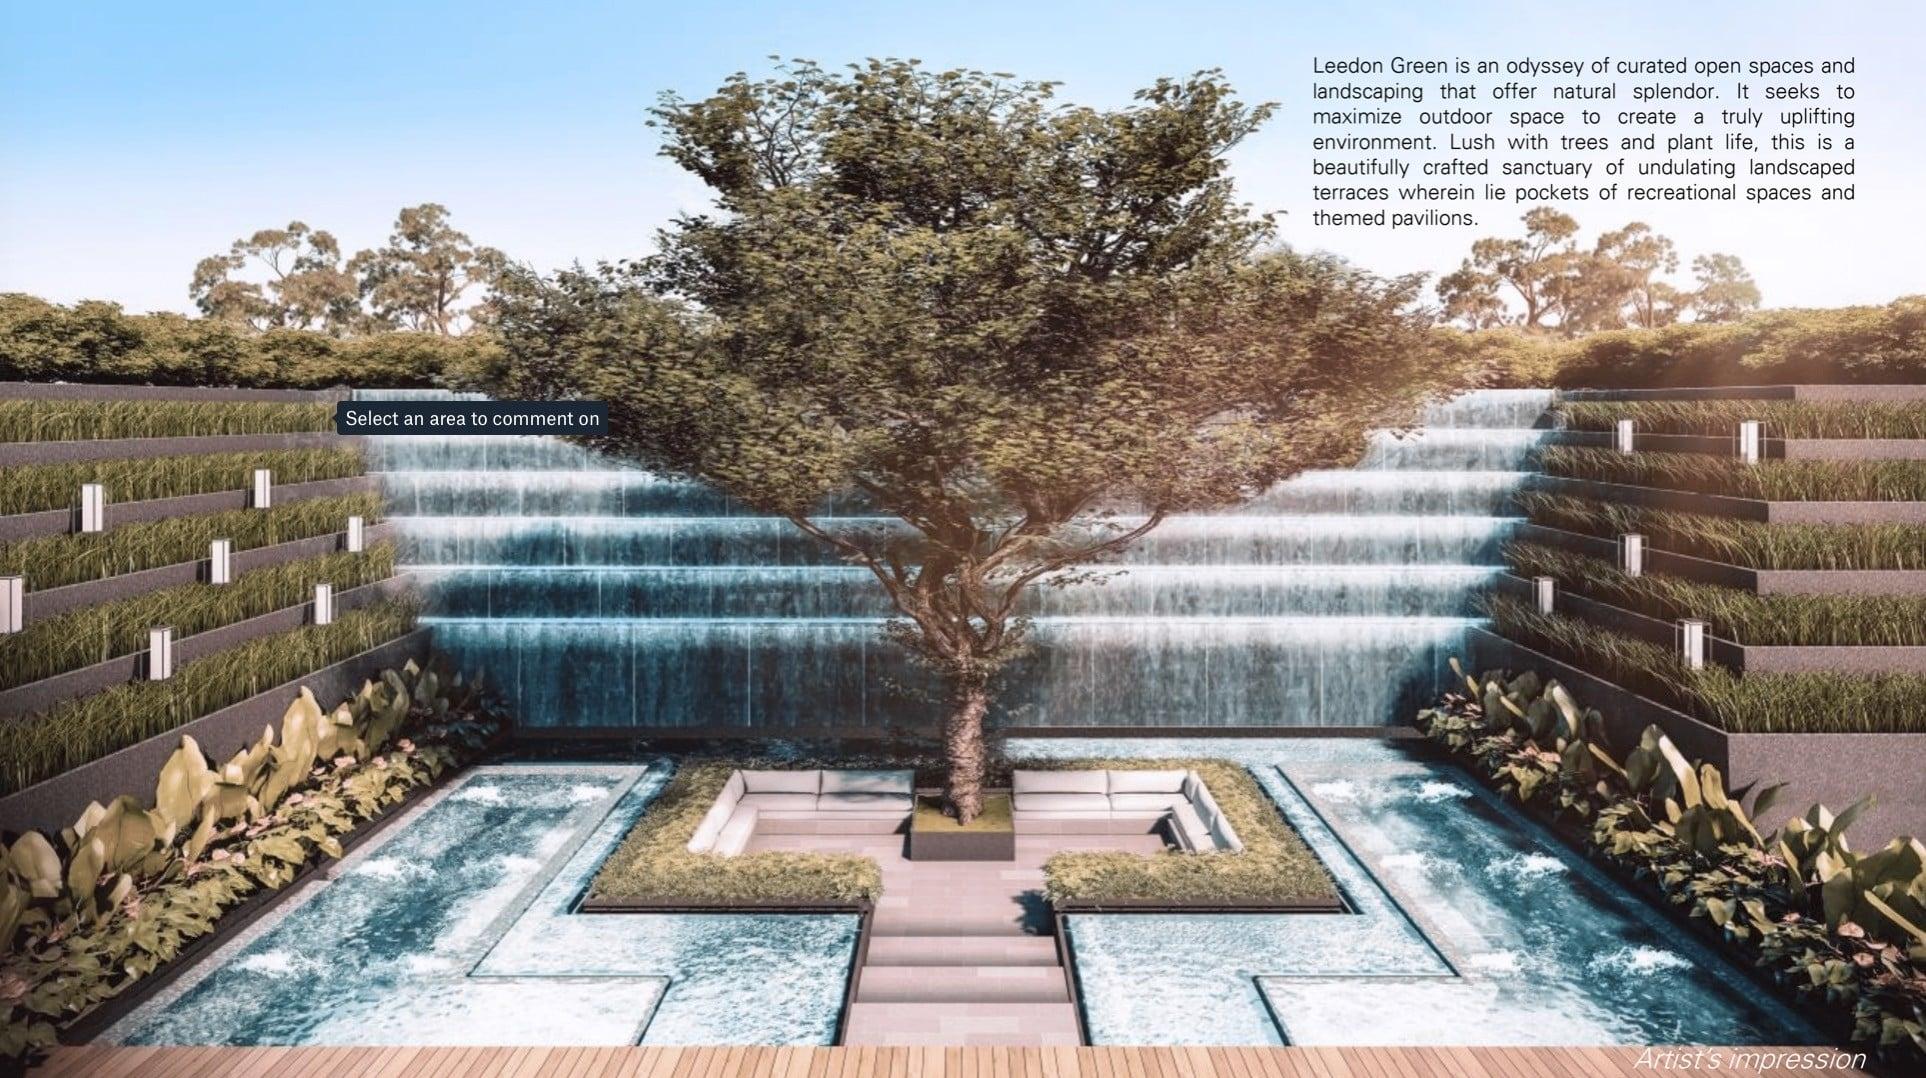 Leedon-Green-waterfall